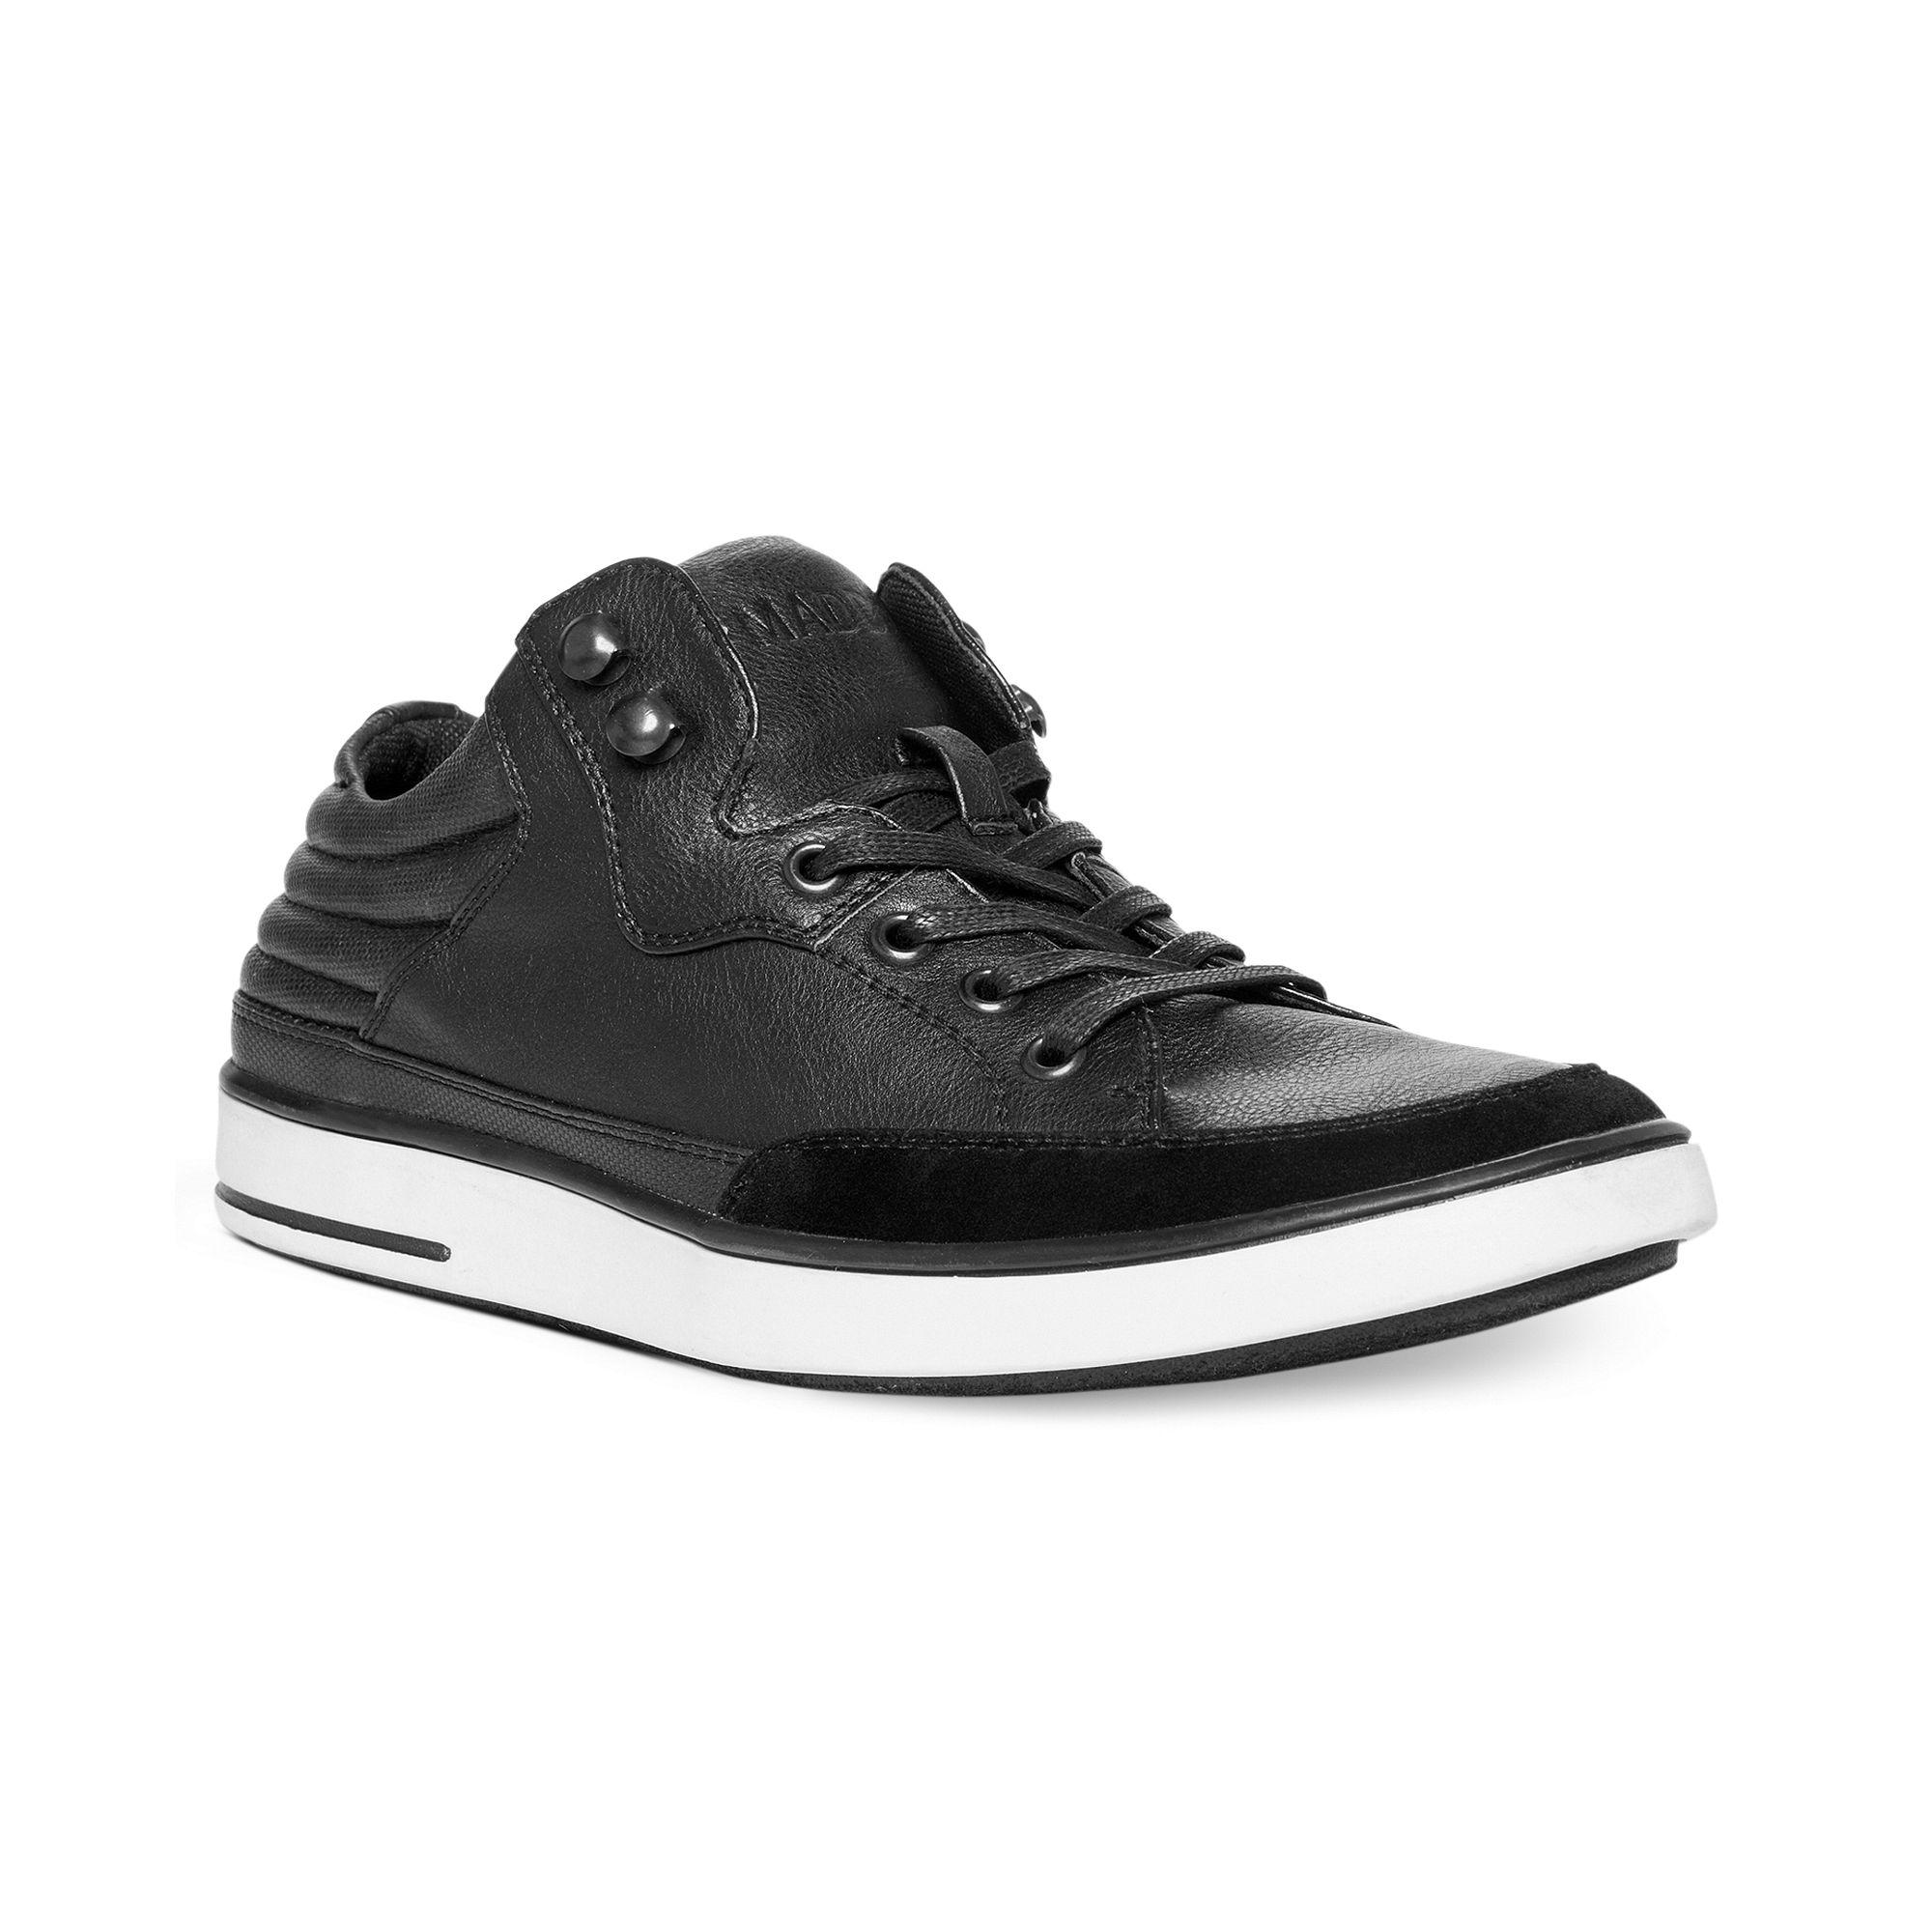 steve madden madden mens shoes symms sneakers in black for